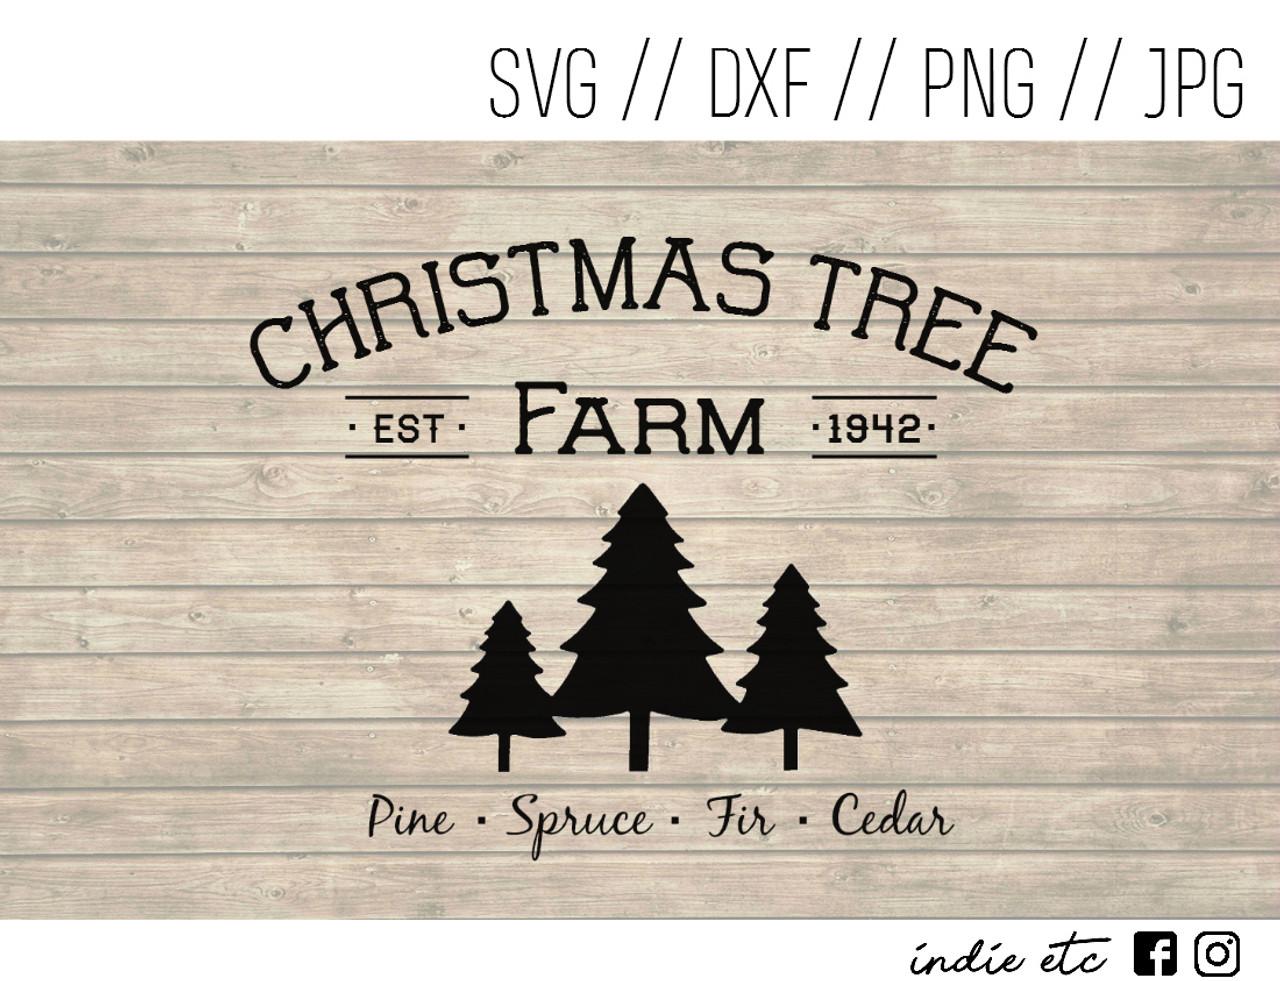 Christmas Tree Farm Digital Art File (svg, dxf, png, jpeg)